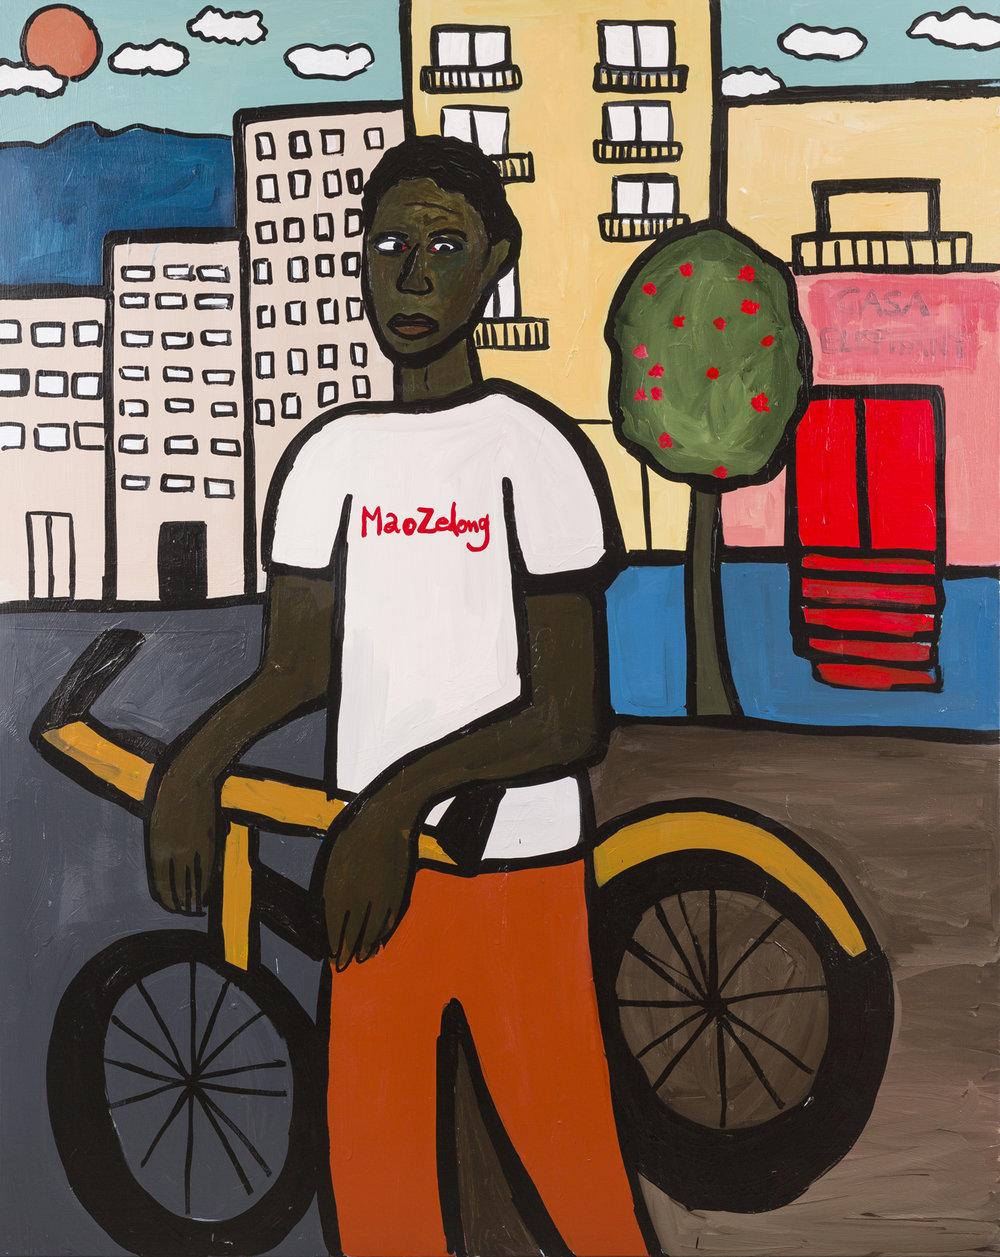 Cassi Namoda   Avenida Mao Zedong  2019 Acrylic on canvas 152.4 x 121.9 cm  Available